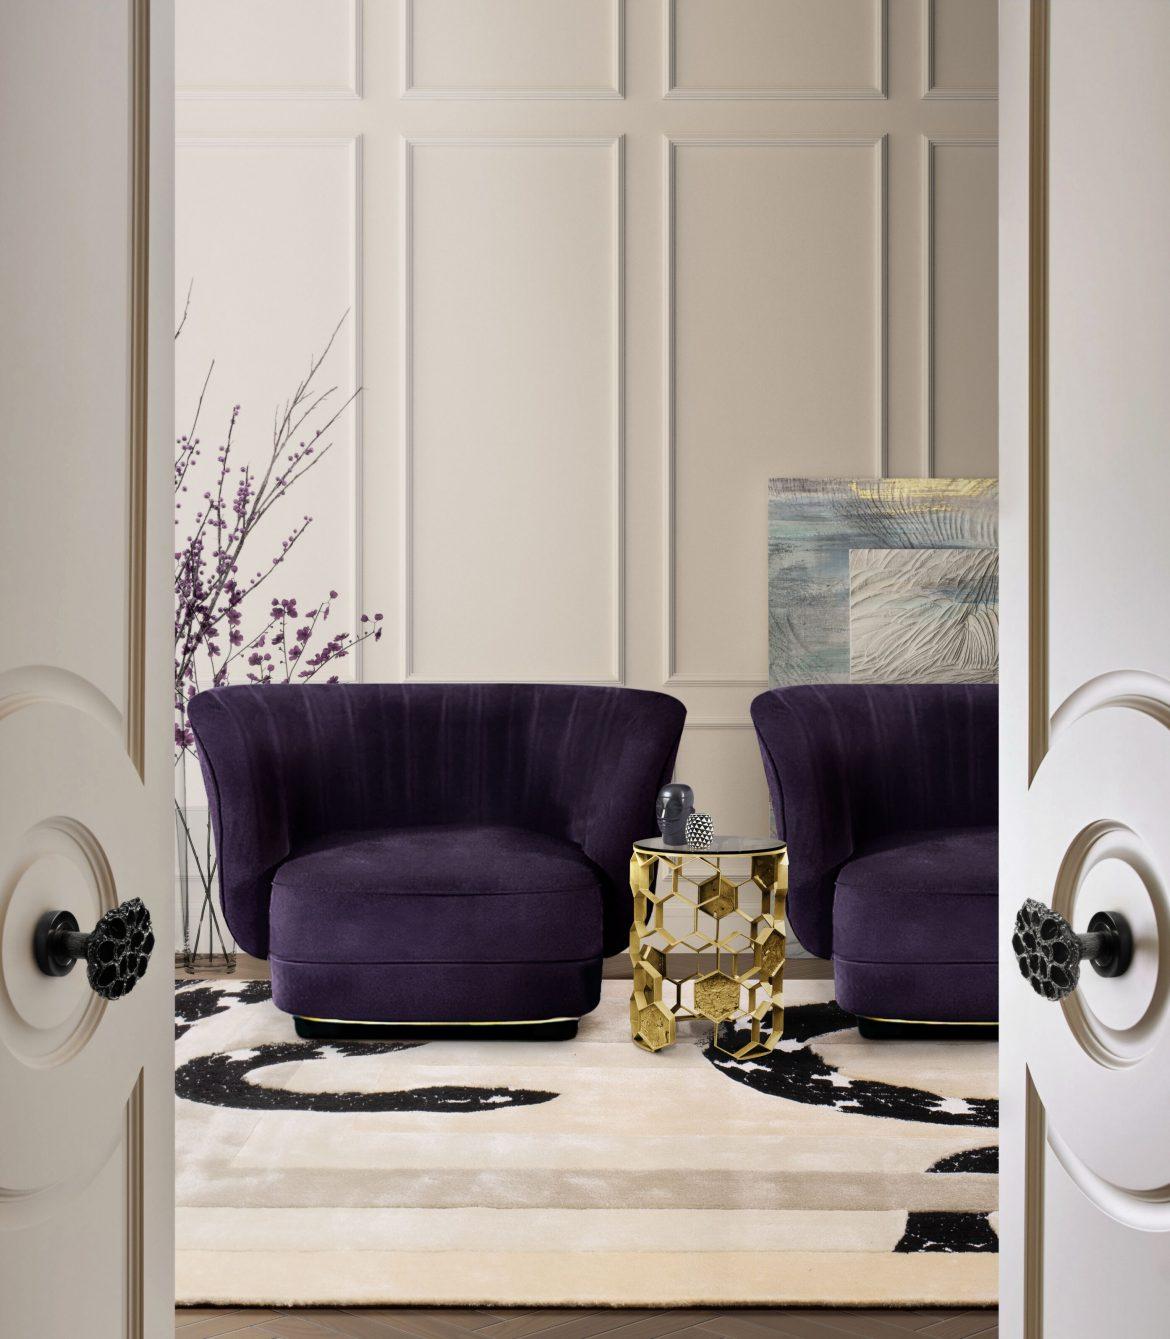 living room ideas 30 Best Living Room Ideas For 2020 best living room ideas 2020 3